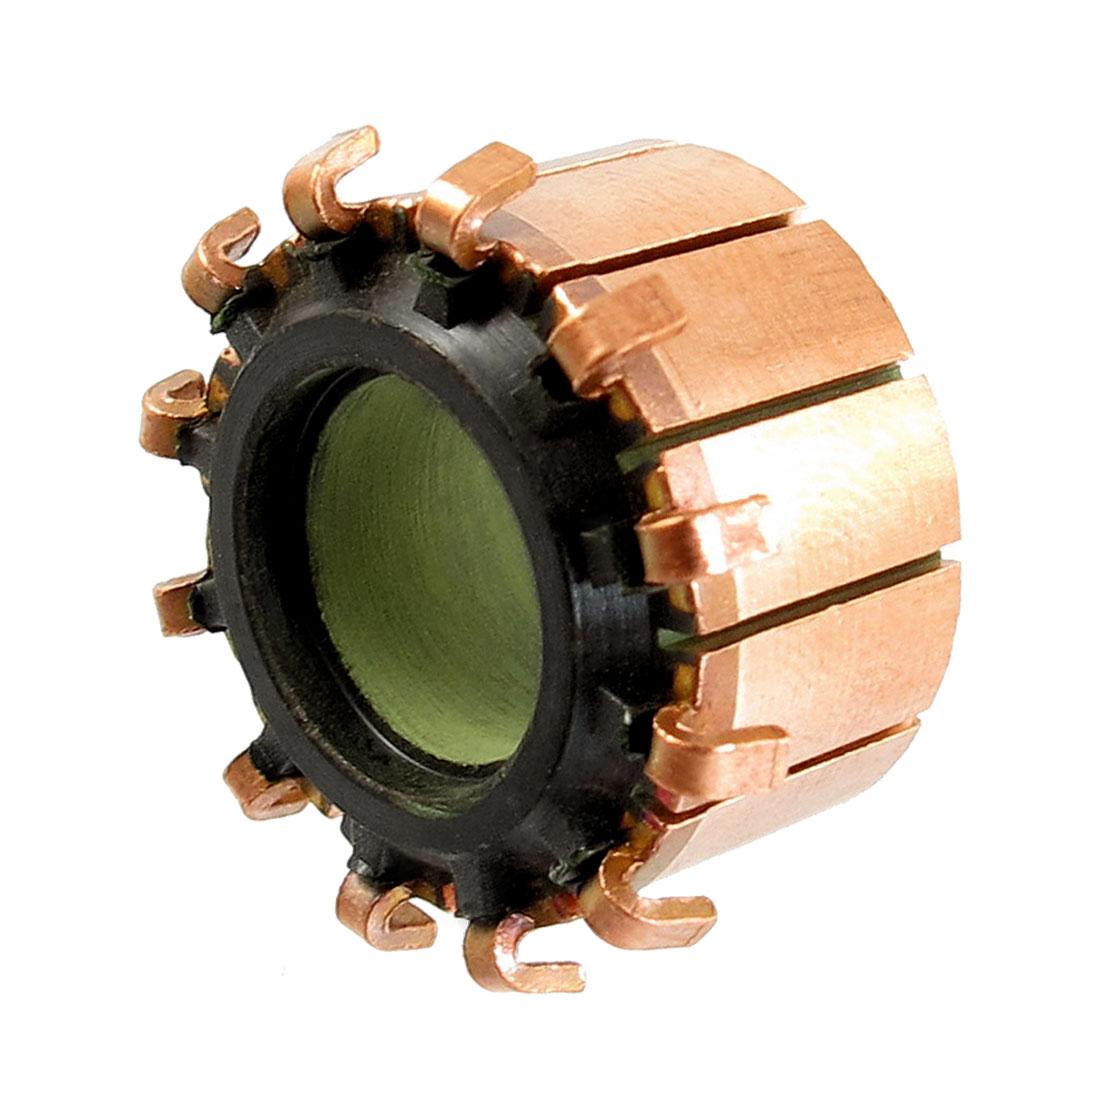 10mm x 18.9mm x 11.7mm 12P Copper Bars Alternator Electric Motor Commutator